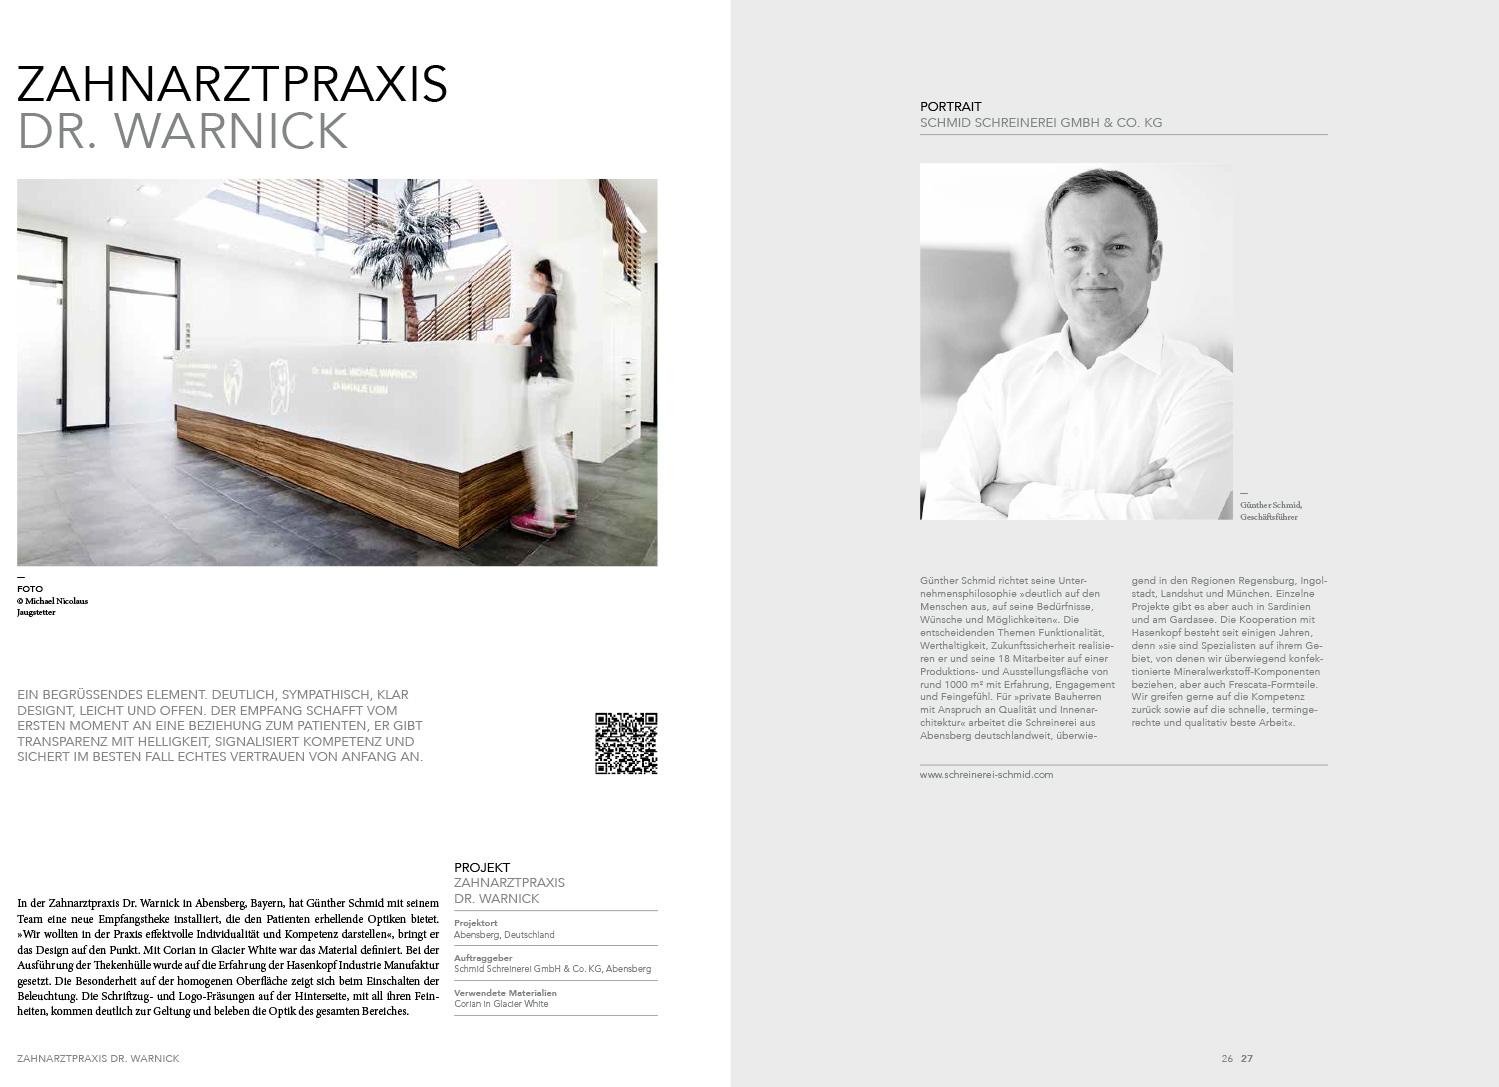 Korrekturabzug02_13-01-2016_Projekt_Zahnarztpraxis_DrWarnick